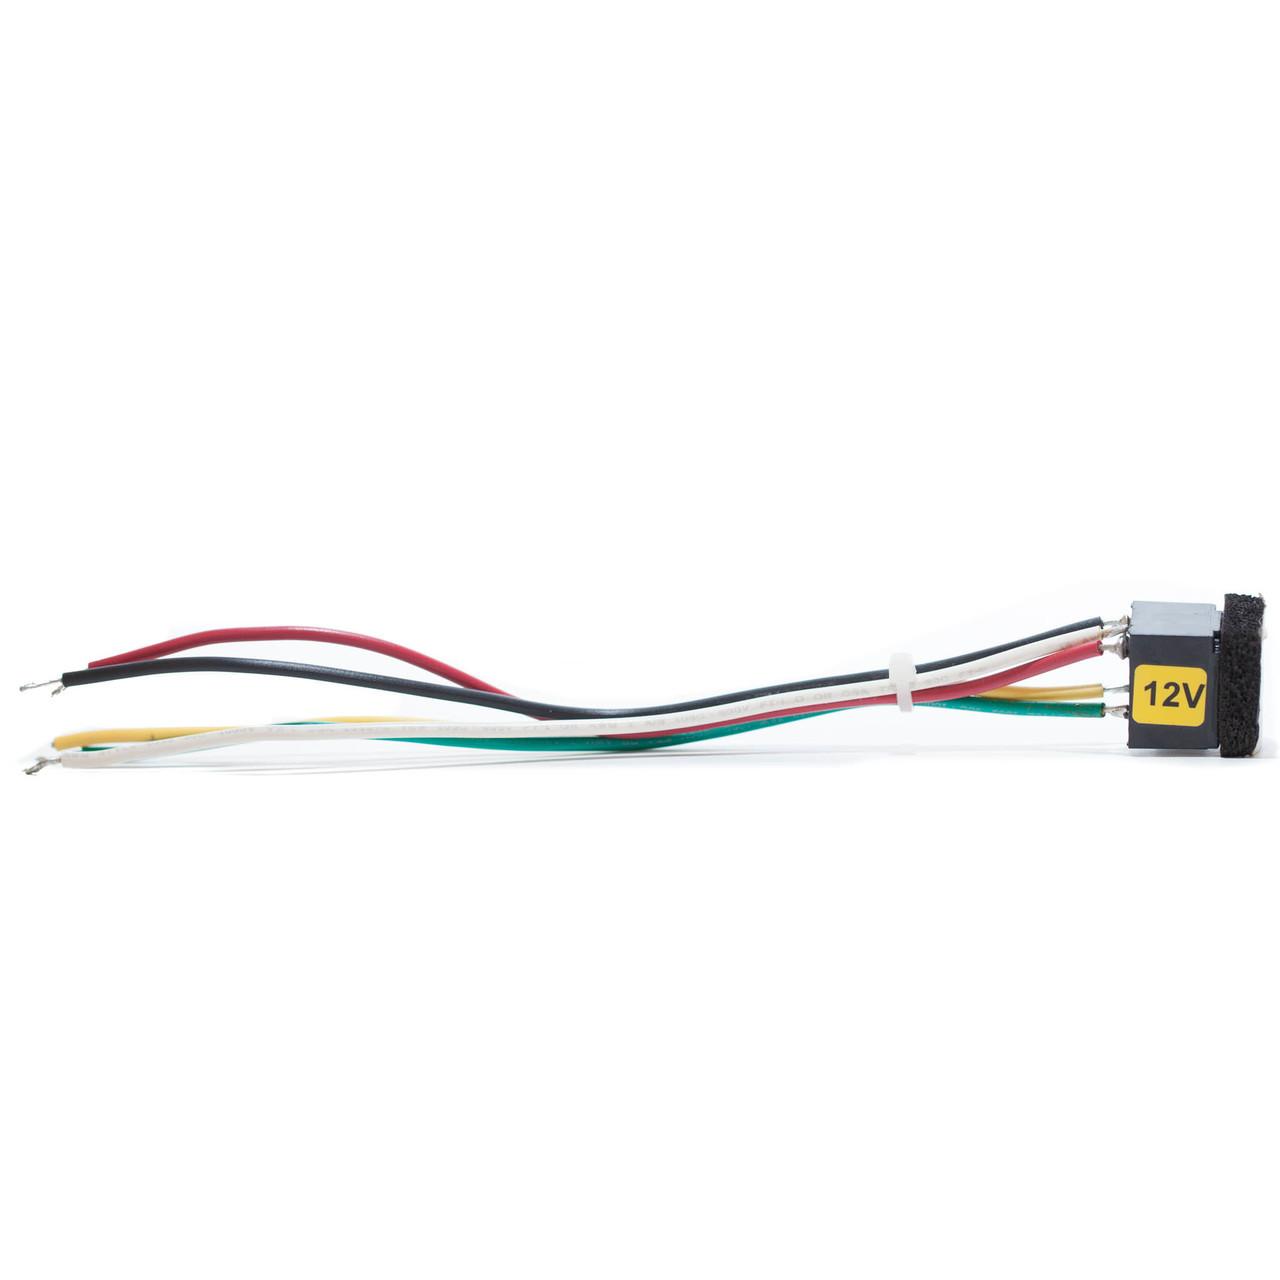 Dsc Rm1 Wiring Diagram Schematic Diagrams Neo 12v Relay Automotive U2022 Alarm Panel